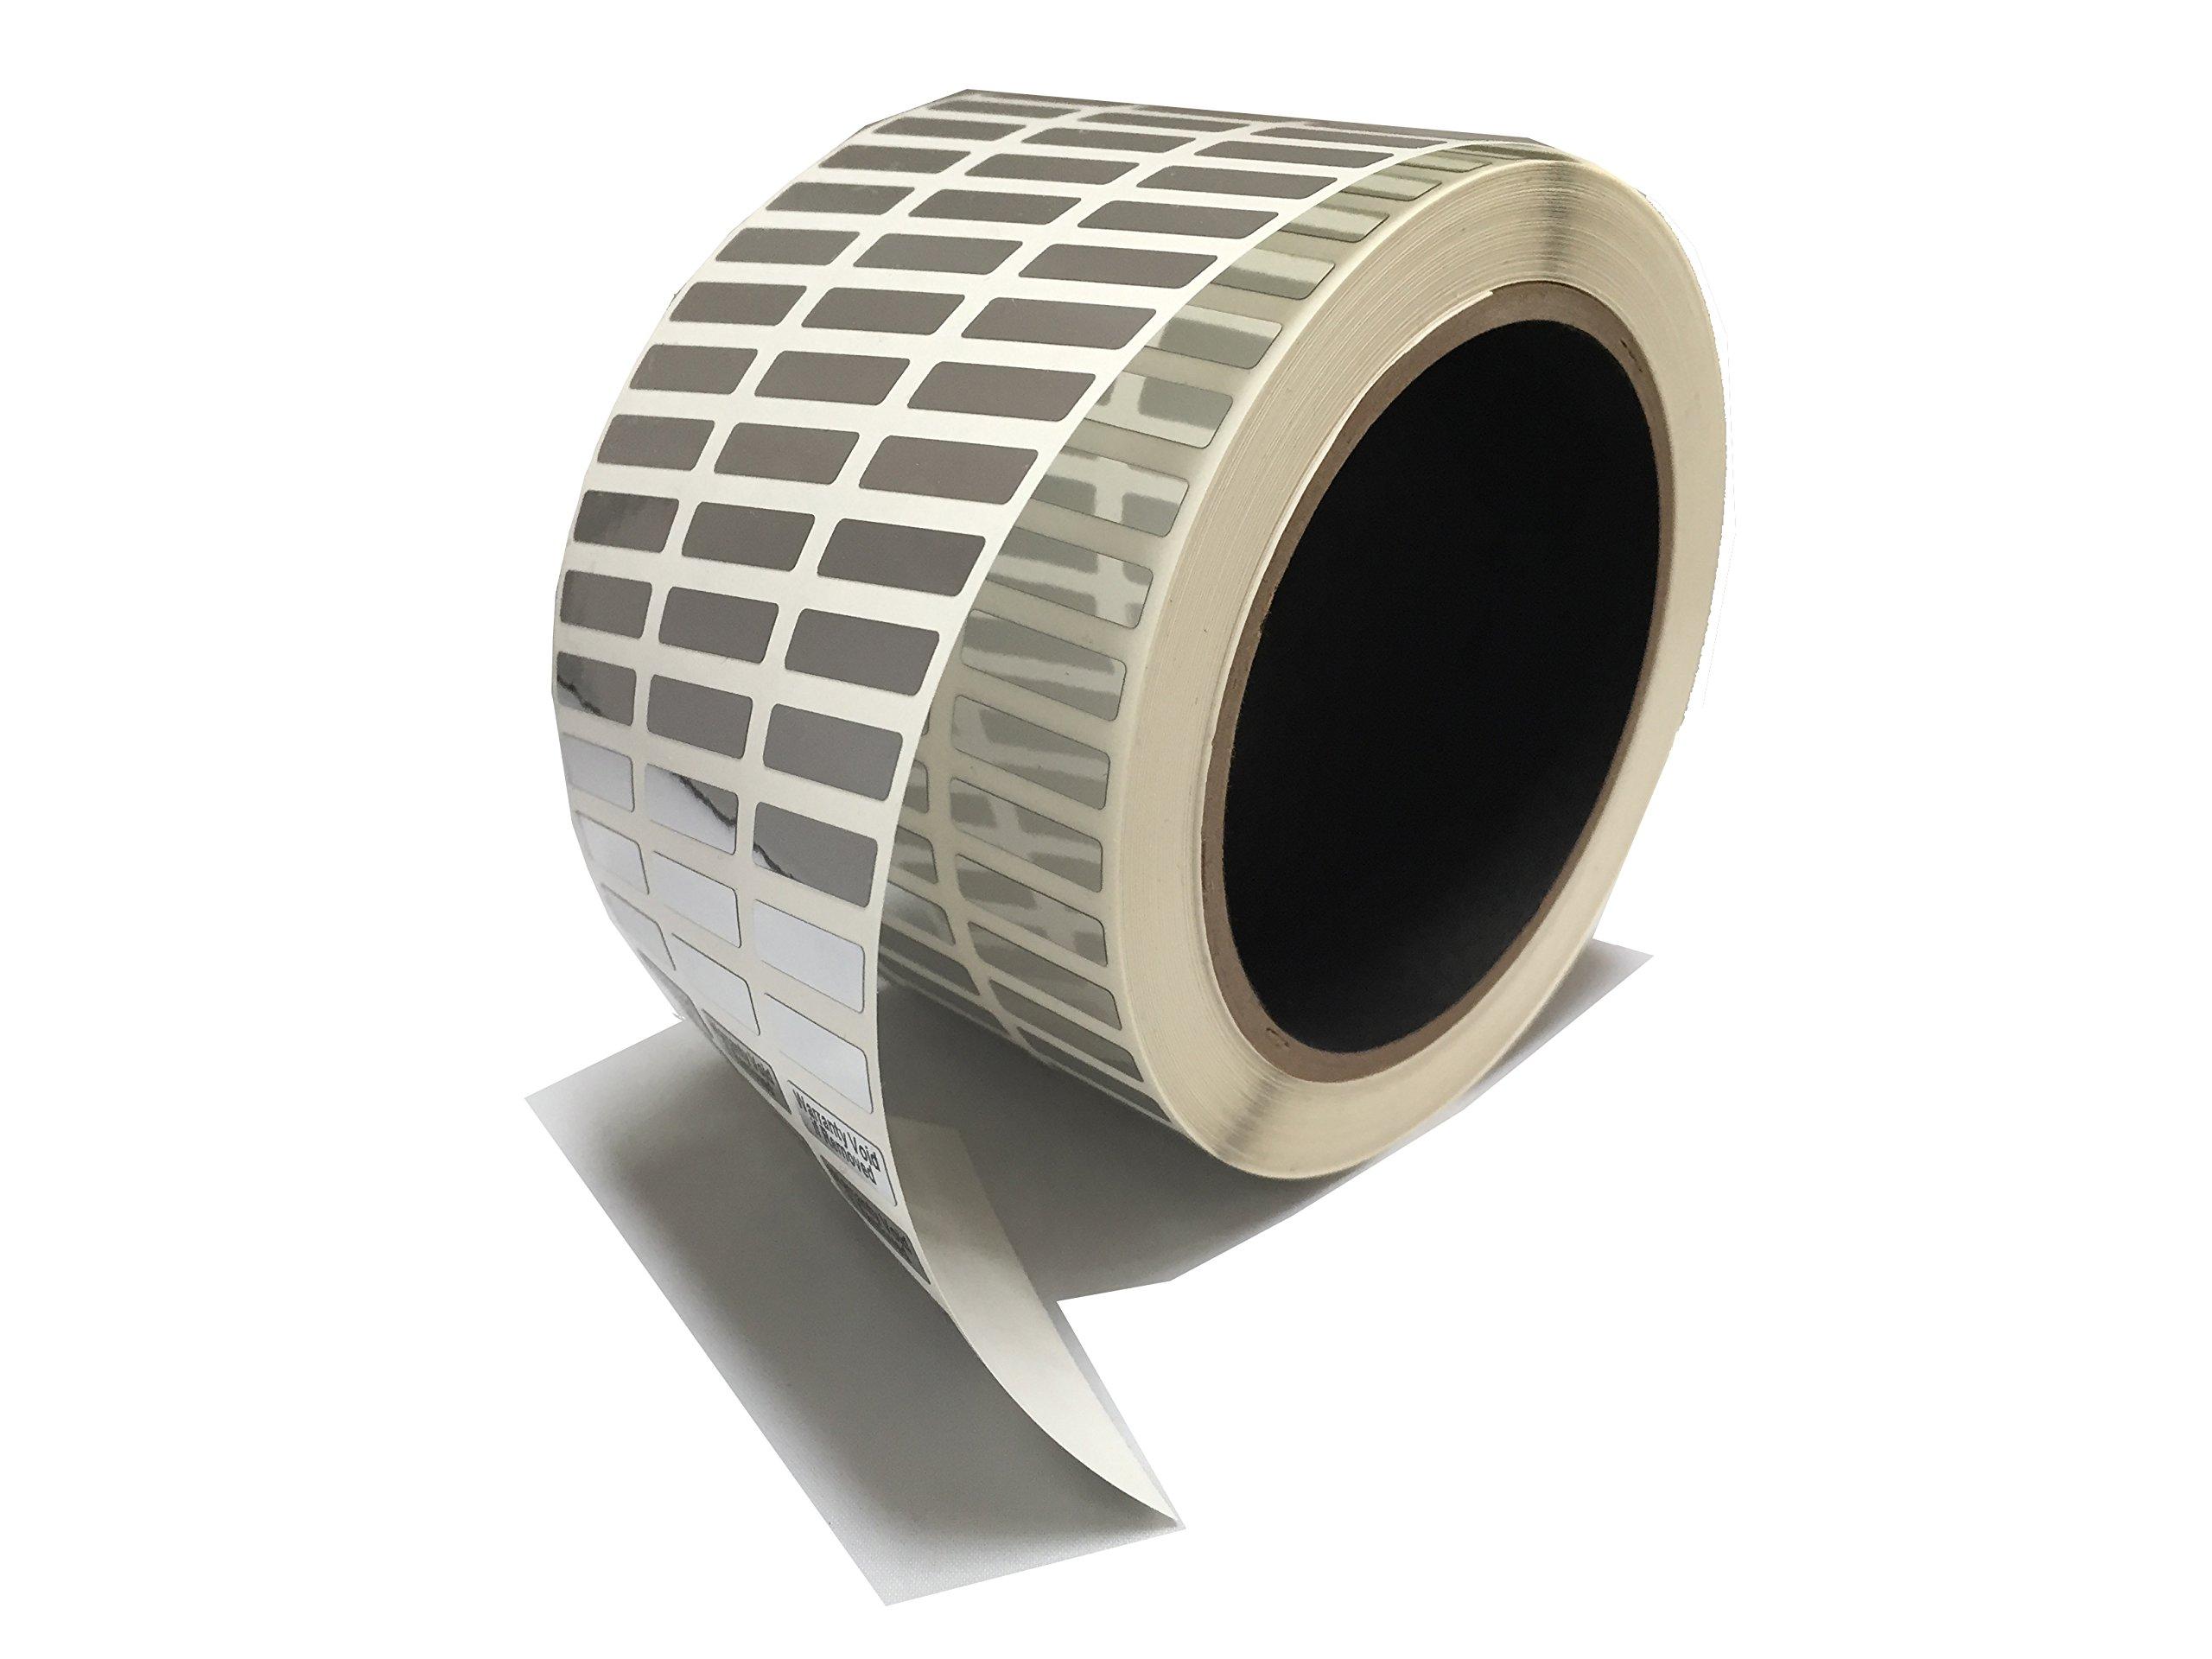 1,000 Silver Bright - Foil TamperVoid Tamper Evident Security Label Seal Sticker, Rectangle 0.75'' x 0.25'' (19mm x 6mm).